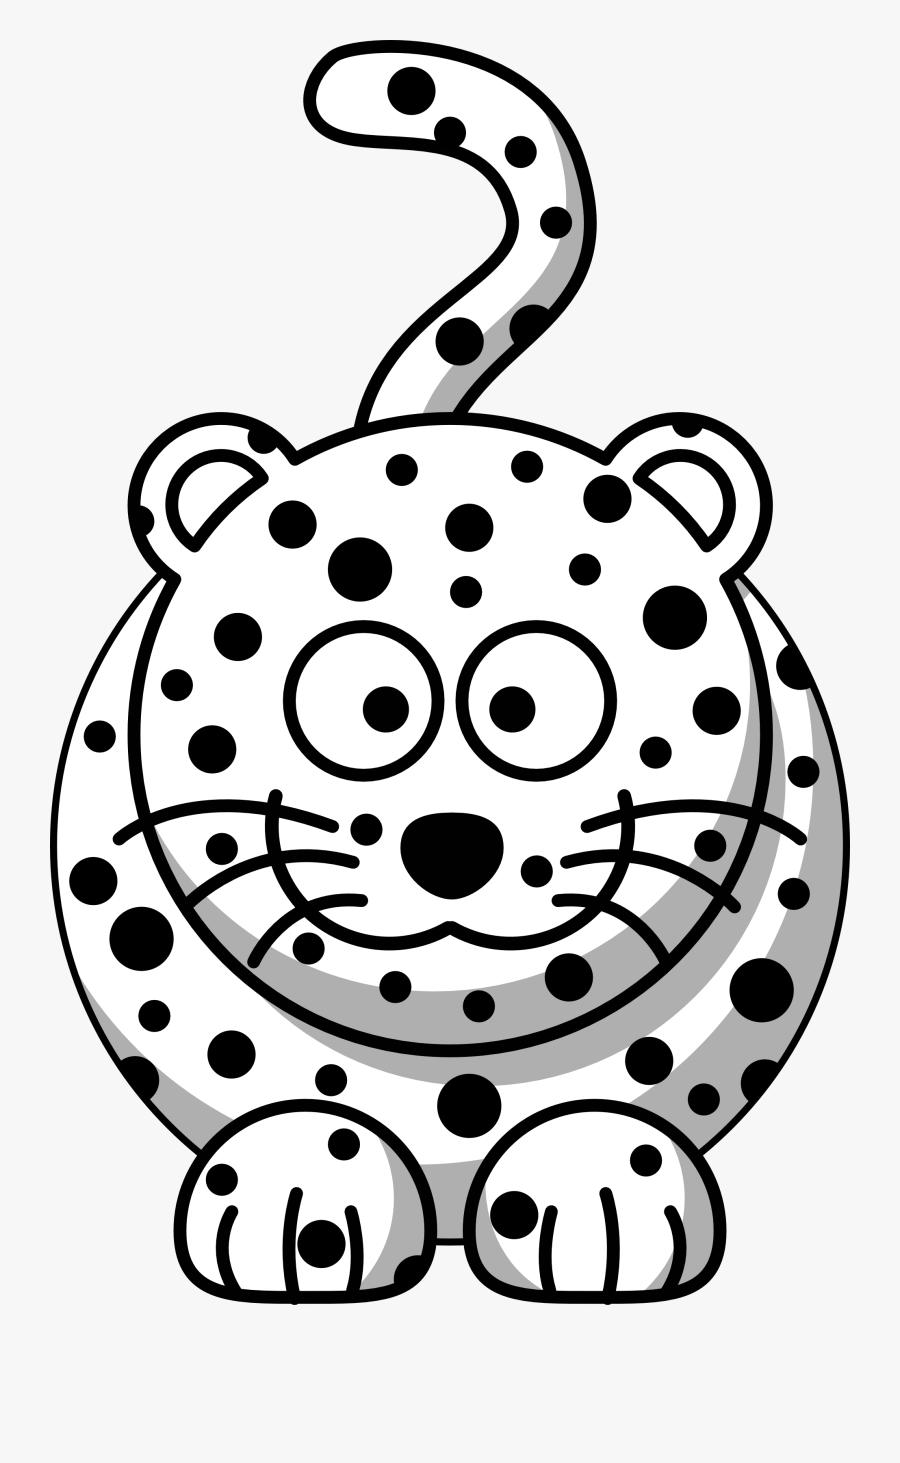 Transparent Leopard Print Png - Draw Snow Leopard Cartoon, Transparent Clipart